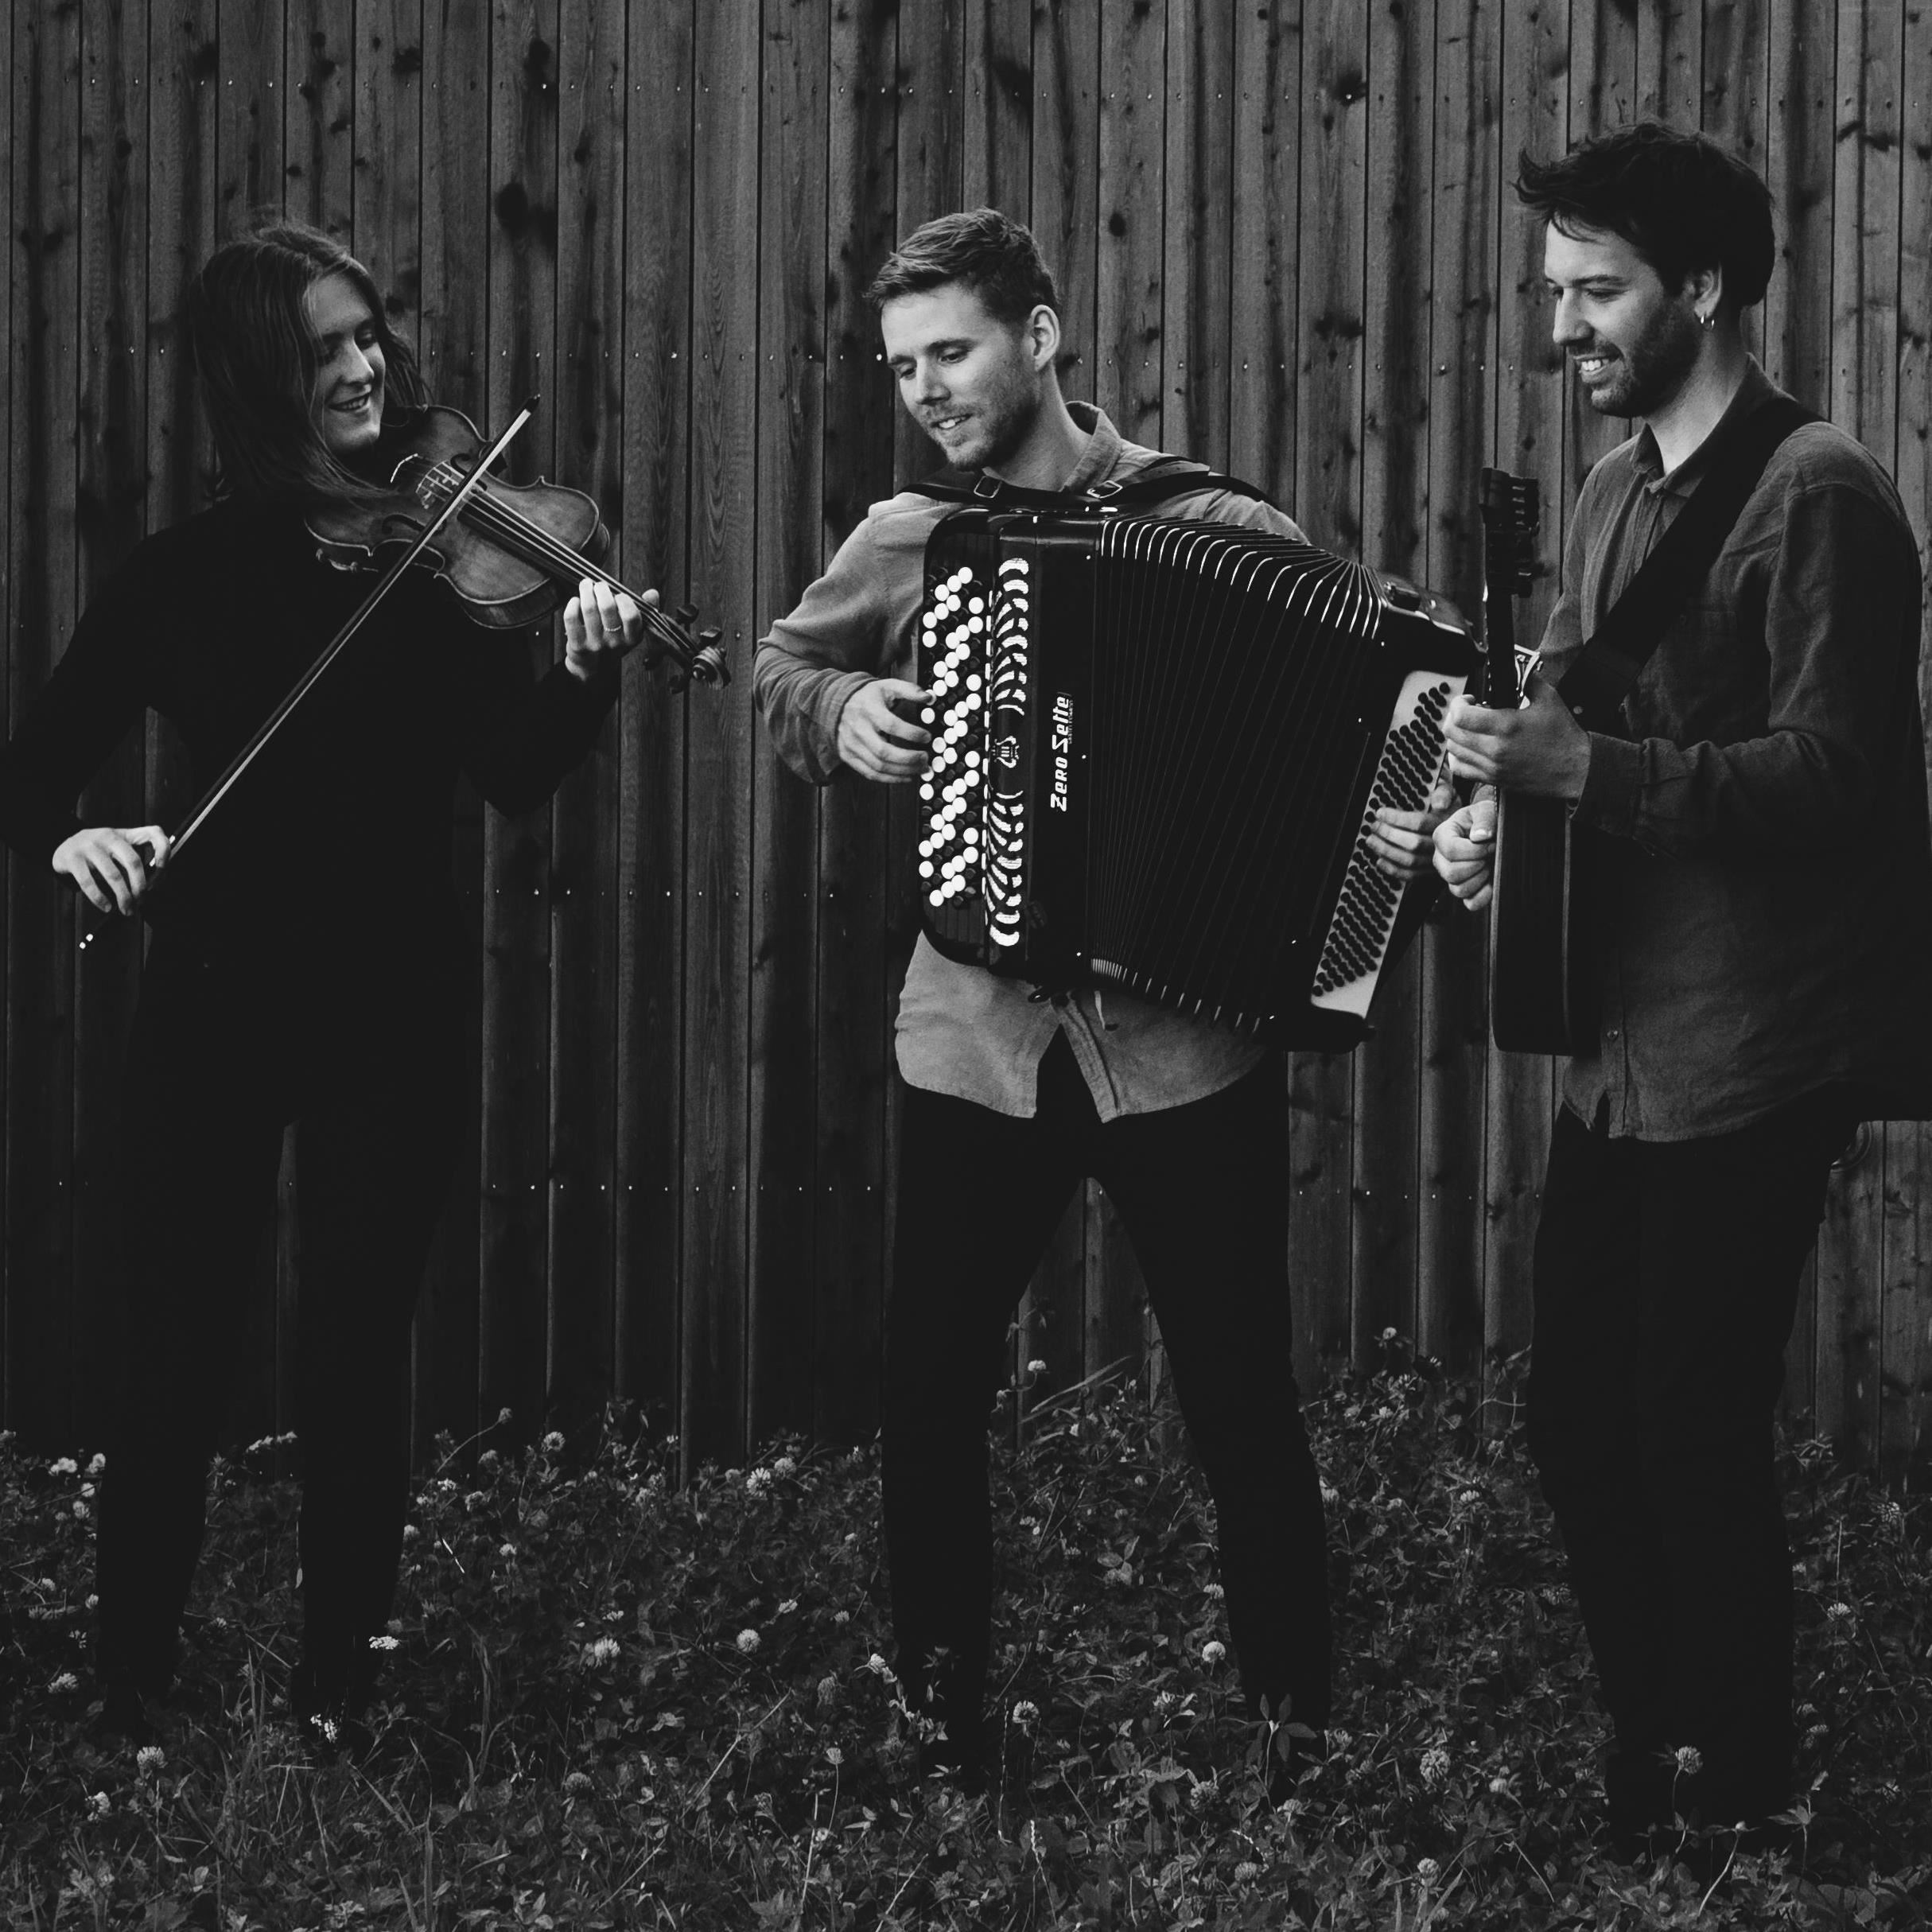 © Wolski, Trio Wolski - nordisk folkmusik i egen tappning